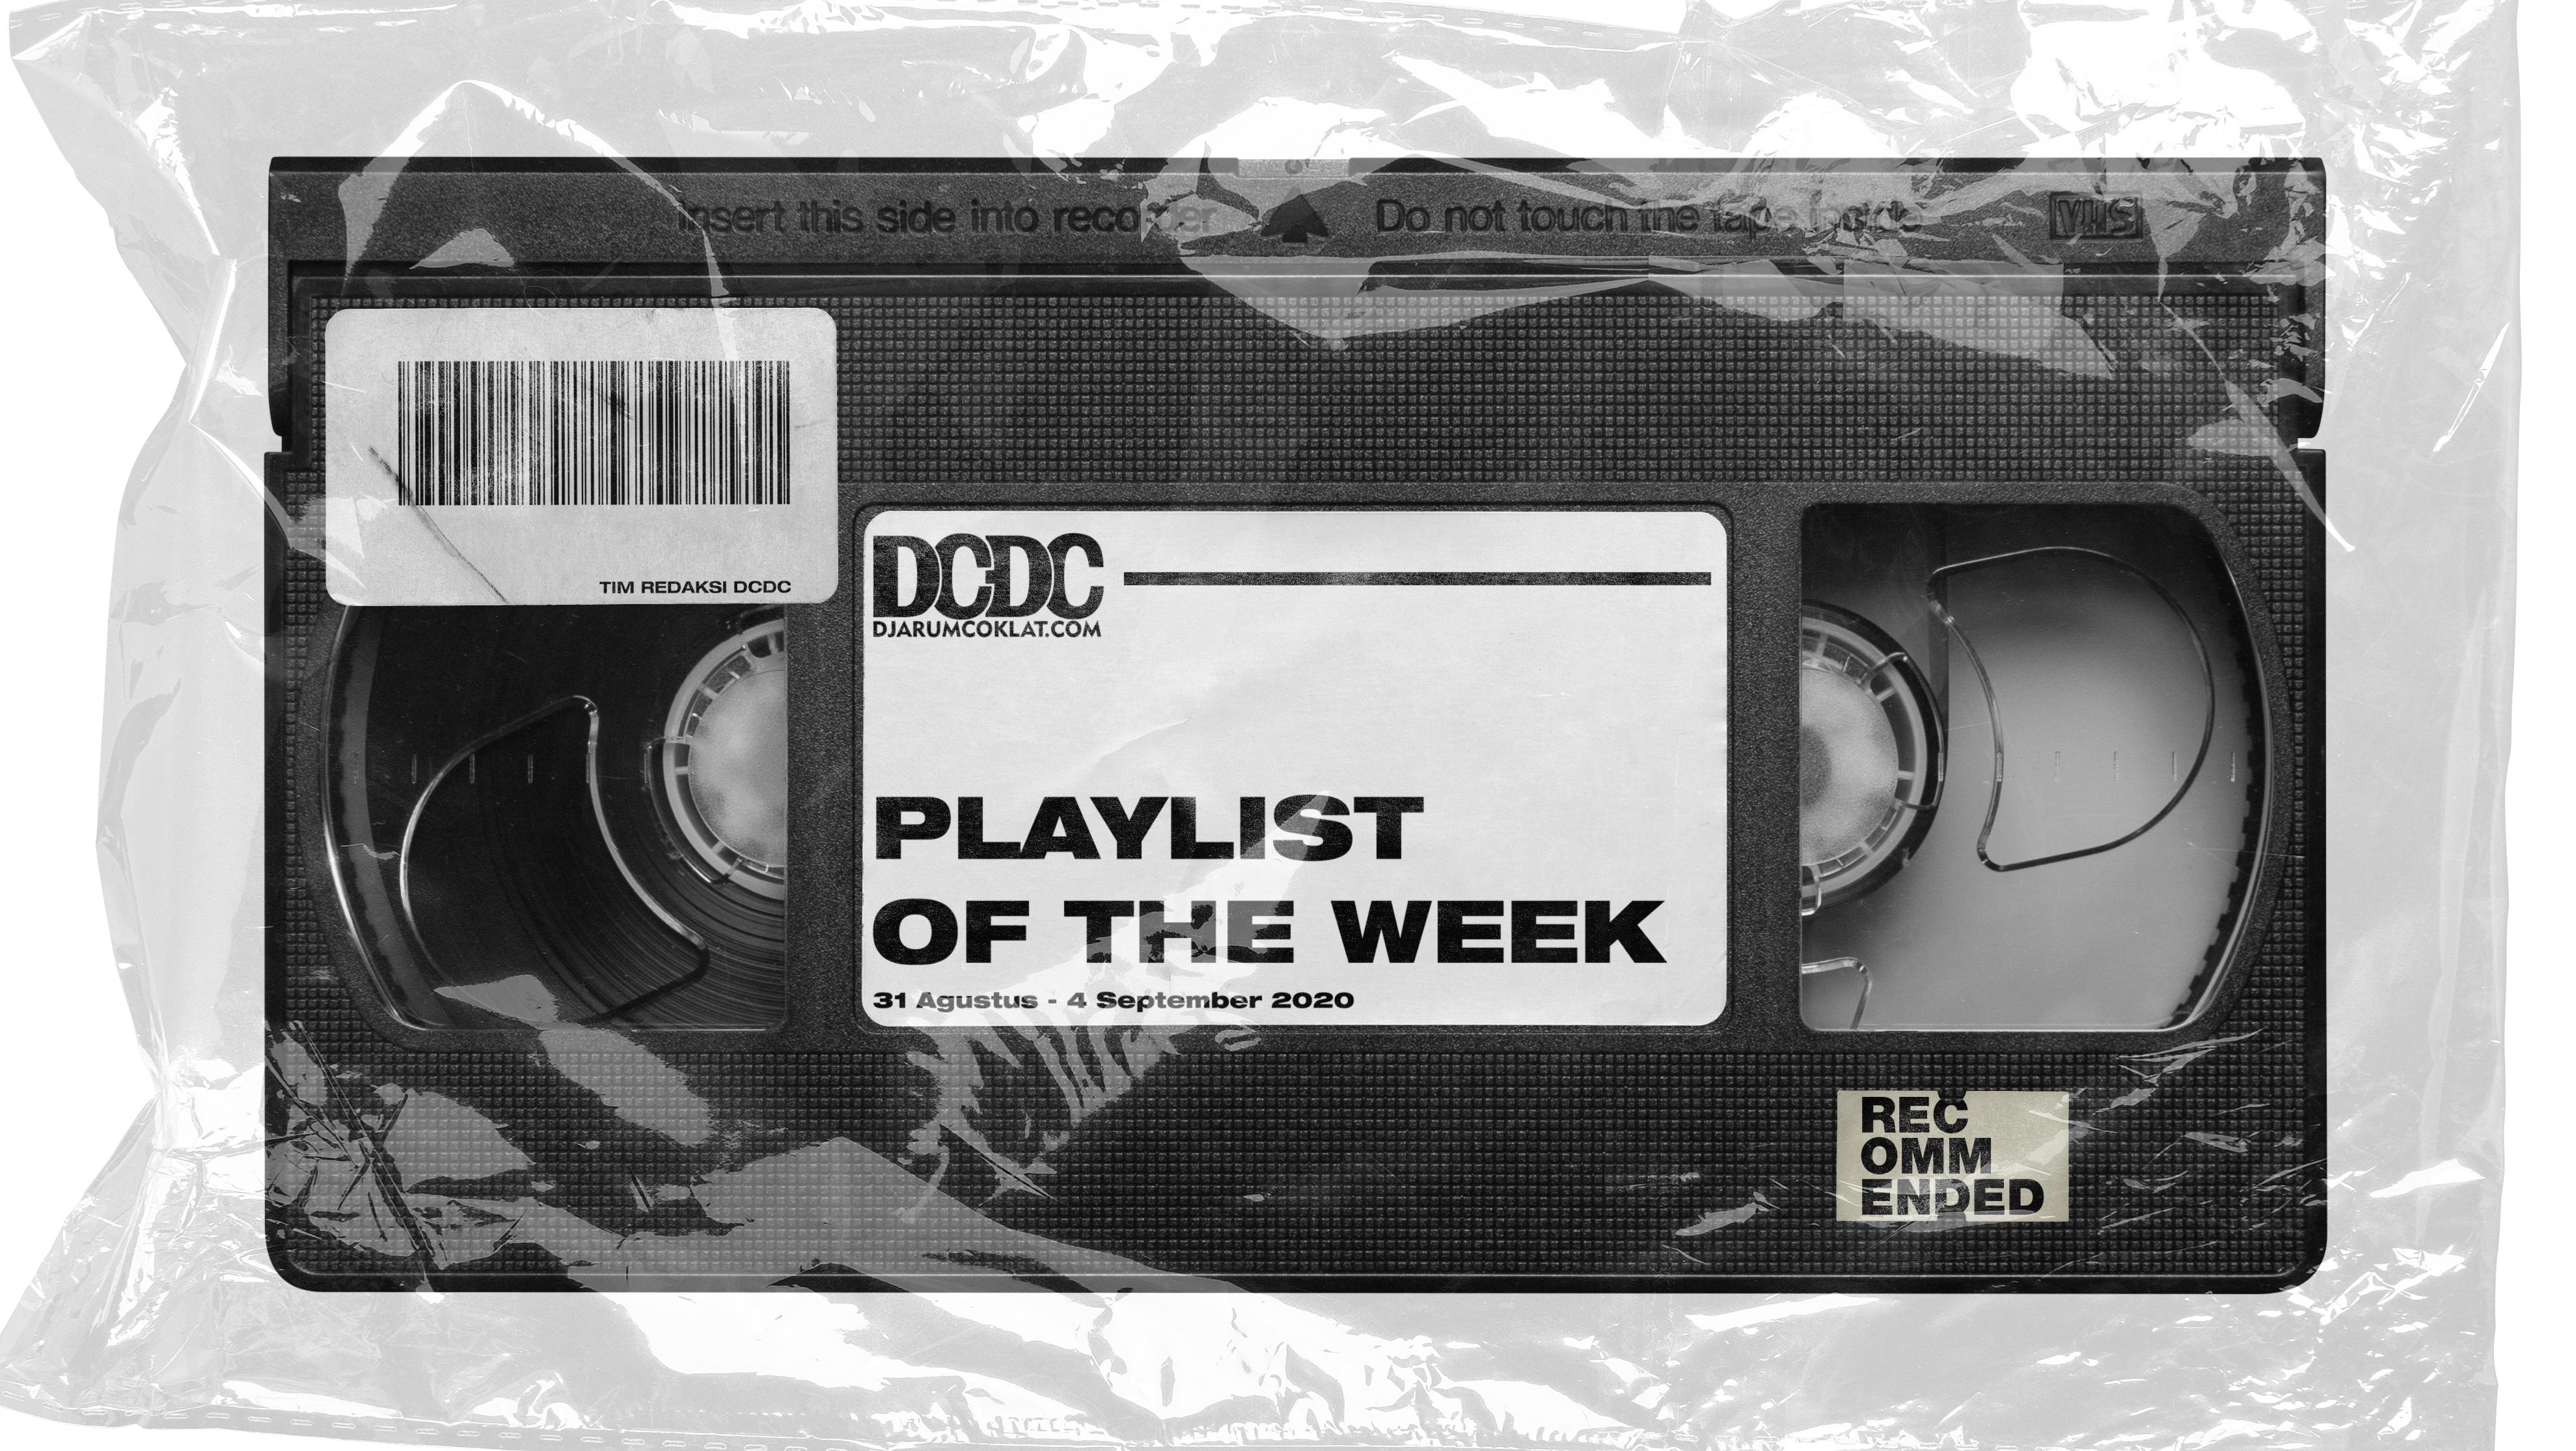 Playlist Of The Week (31 Agustus - 04 September 2020)